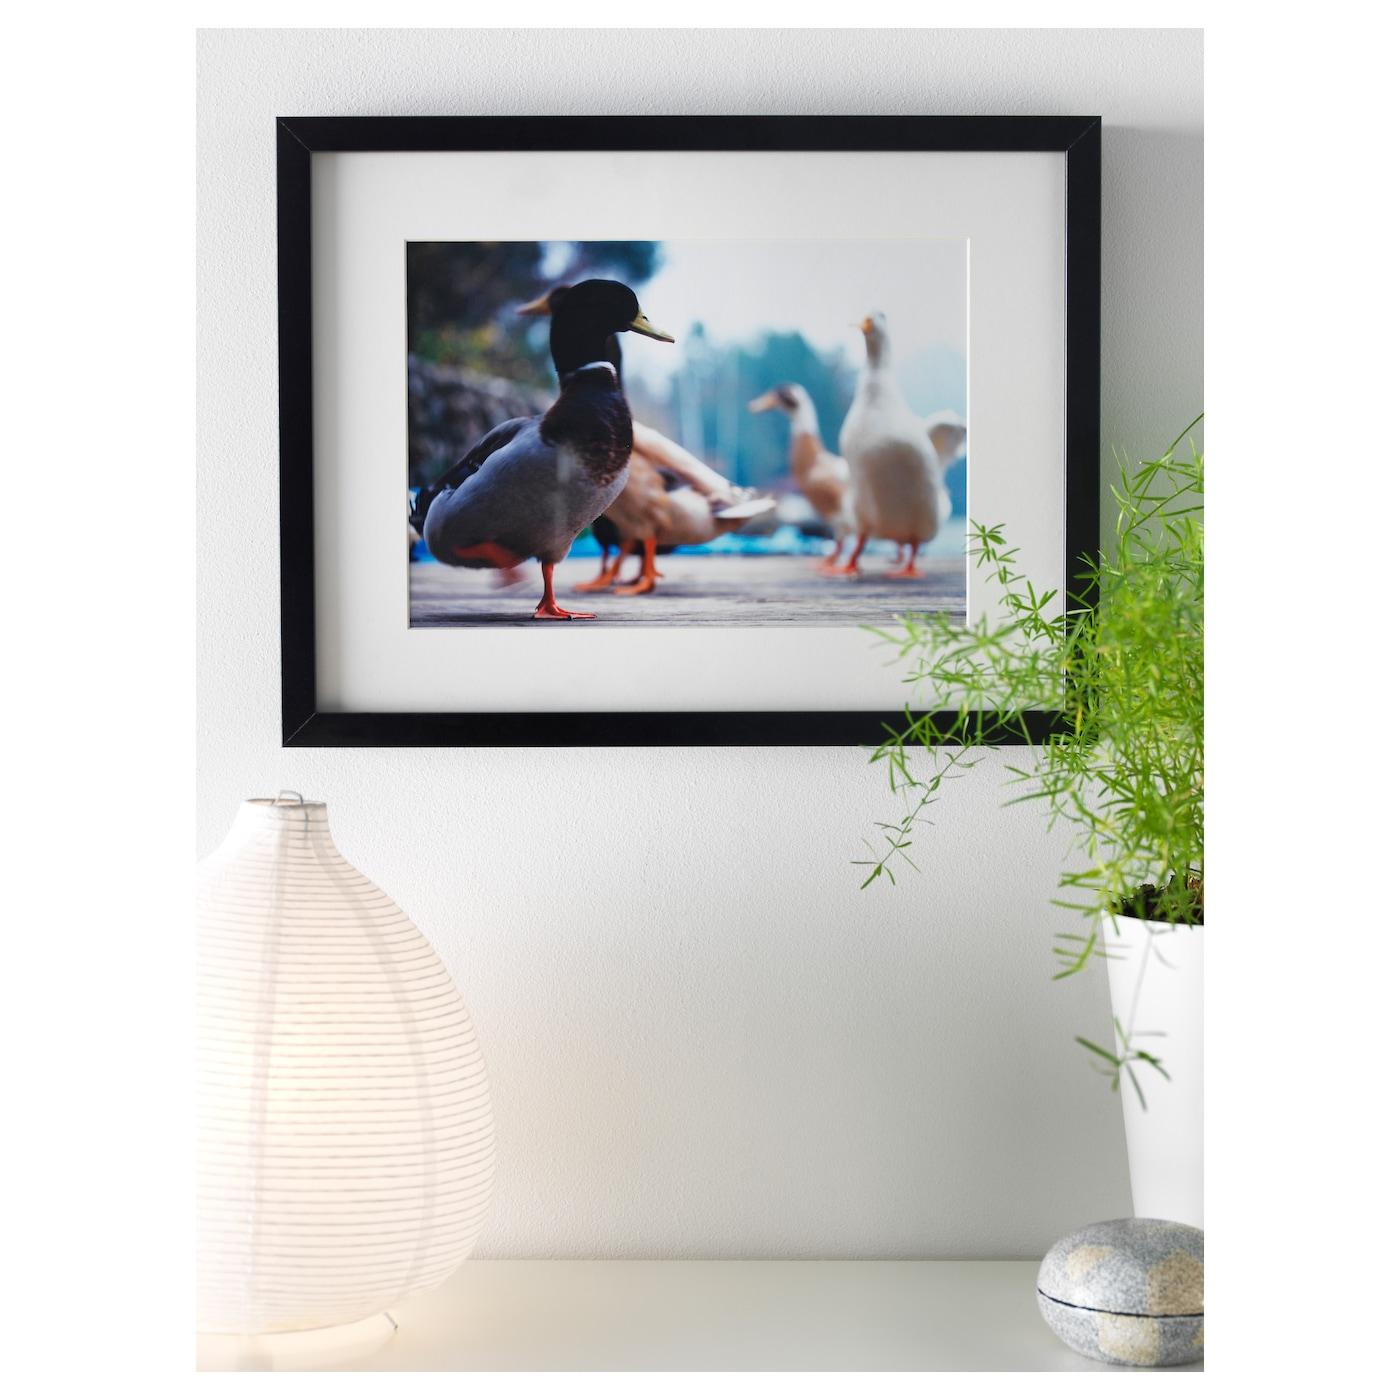 RIBBA Frame Black 30 x 40 cm - IKEA